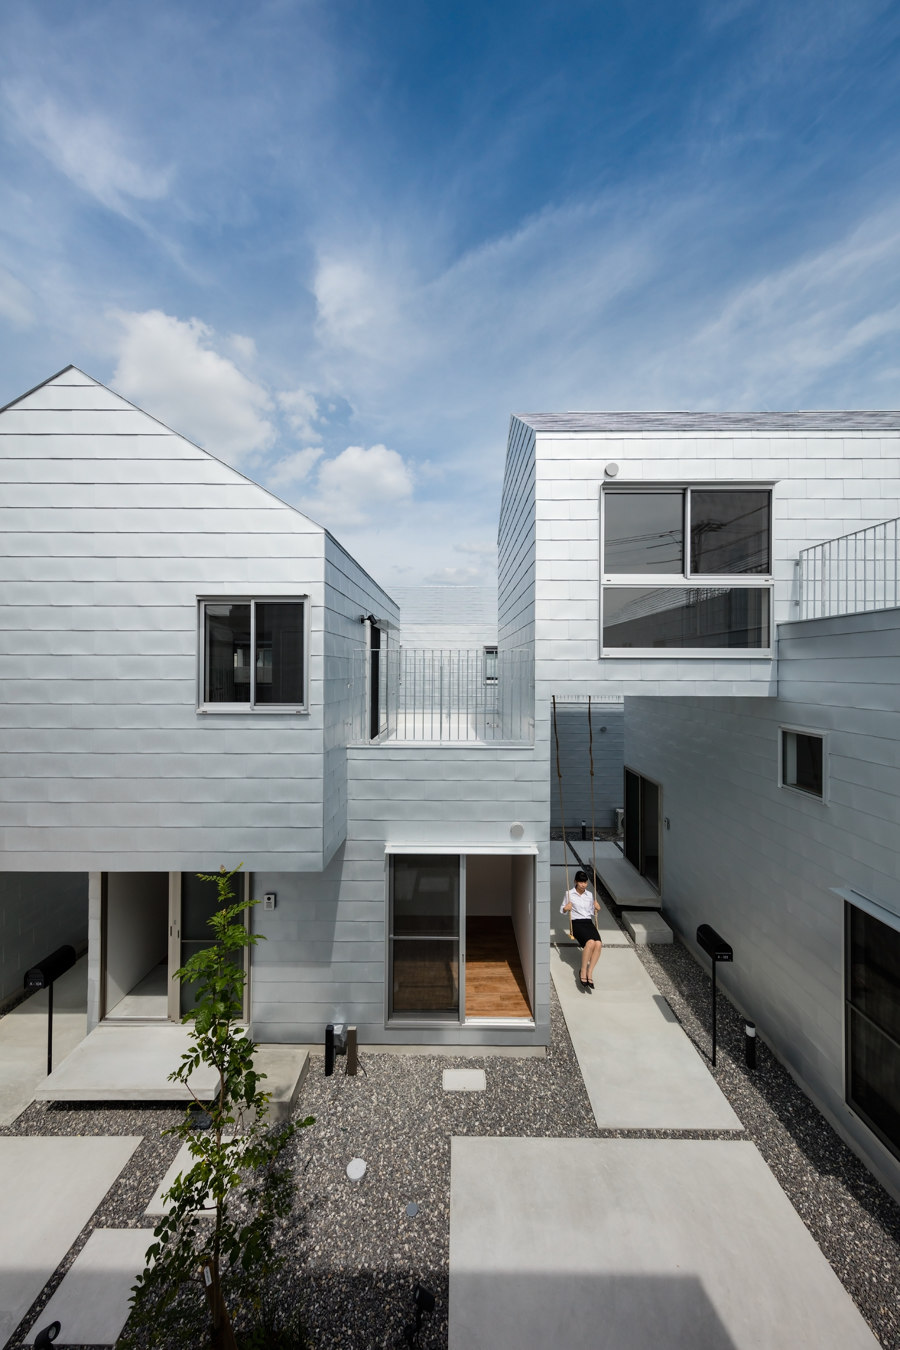 Chronos Dwell by Masahiko Fujimori | Detached houses